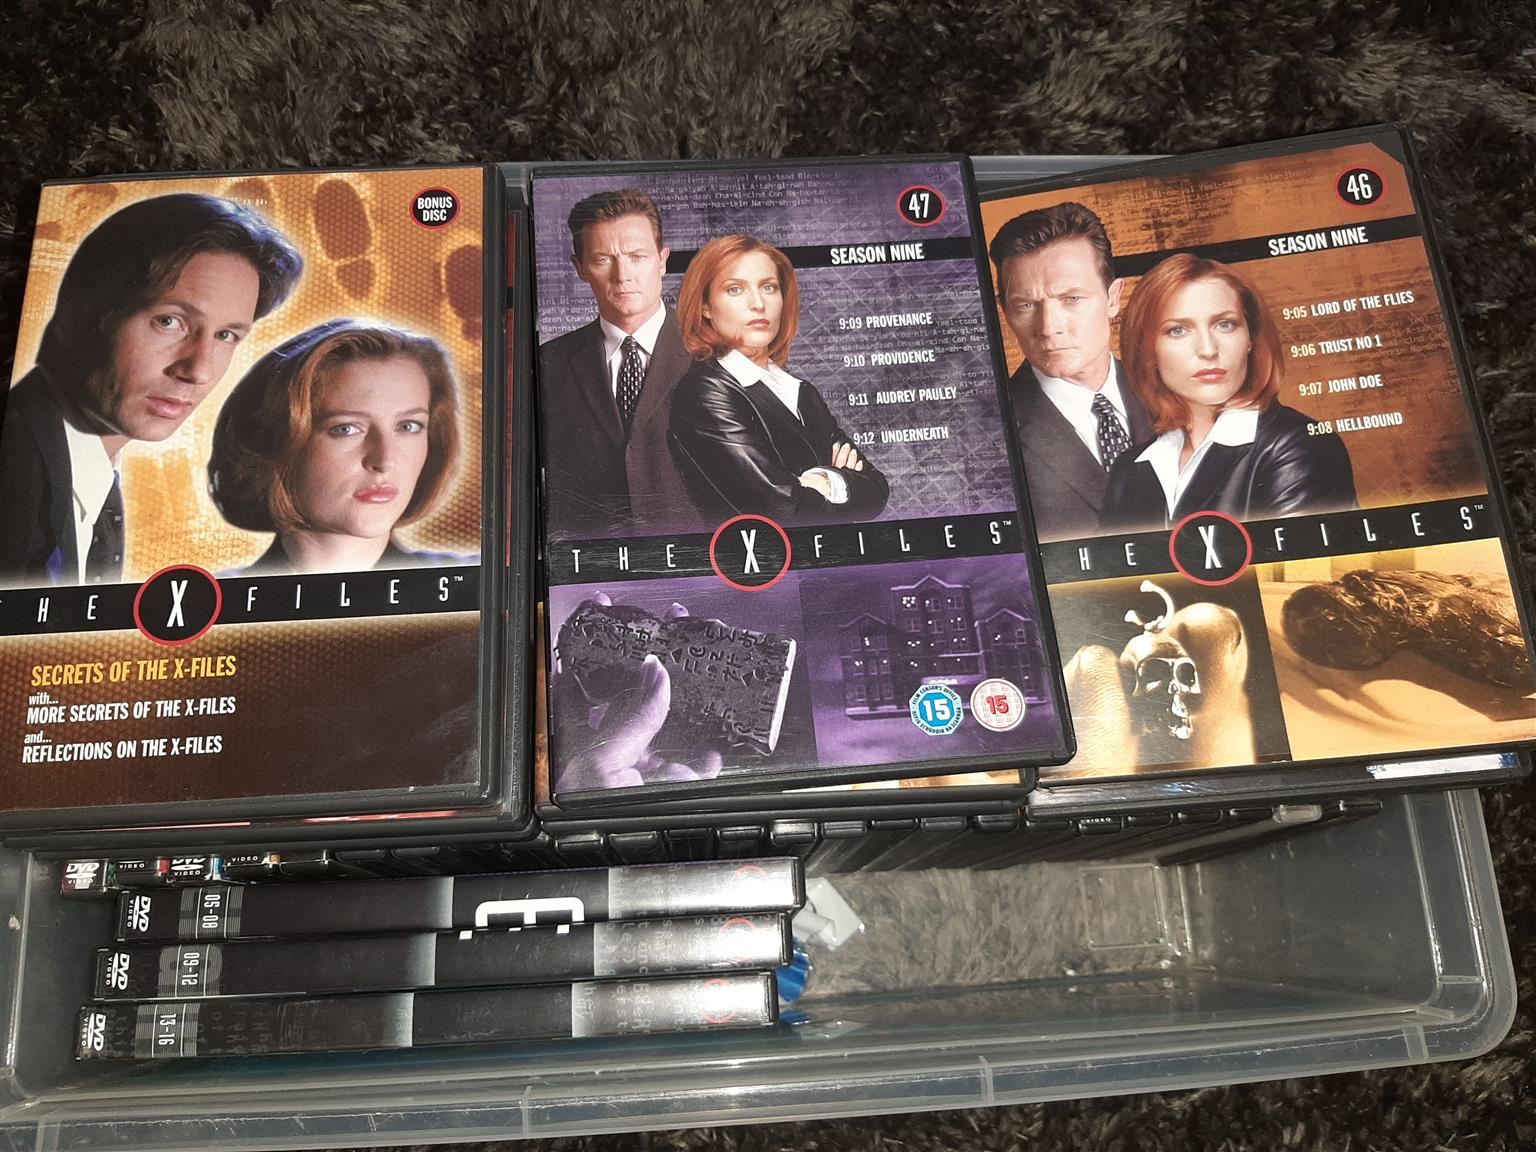 The X-Files dvd